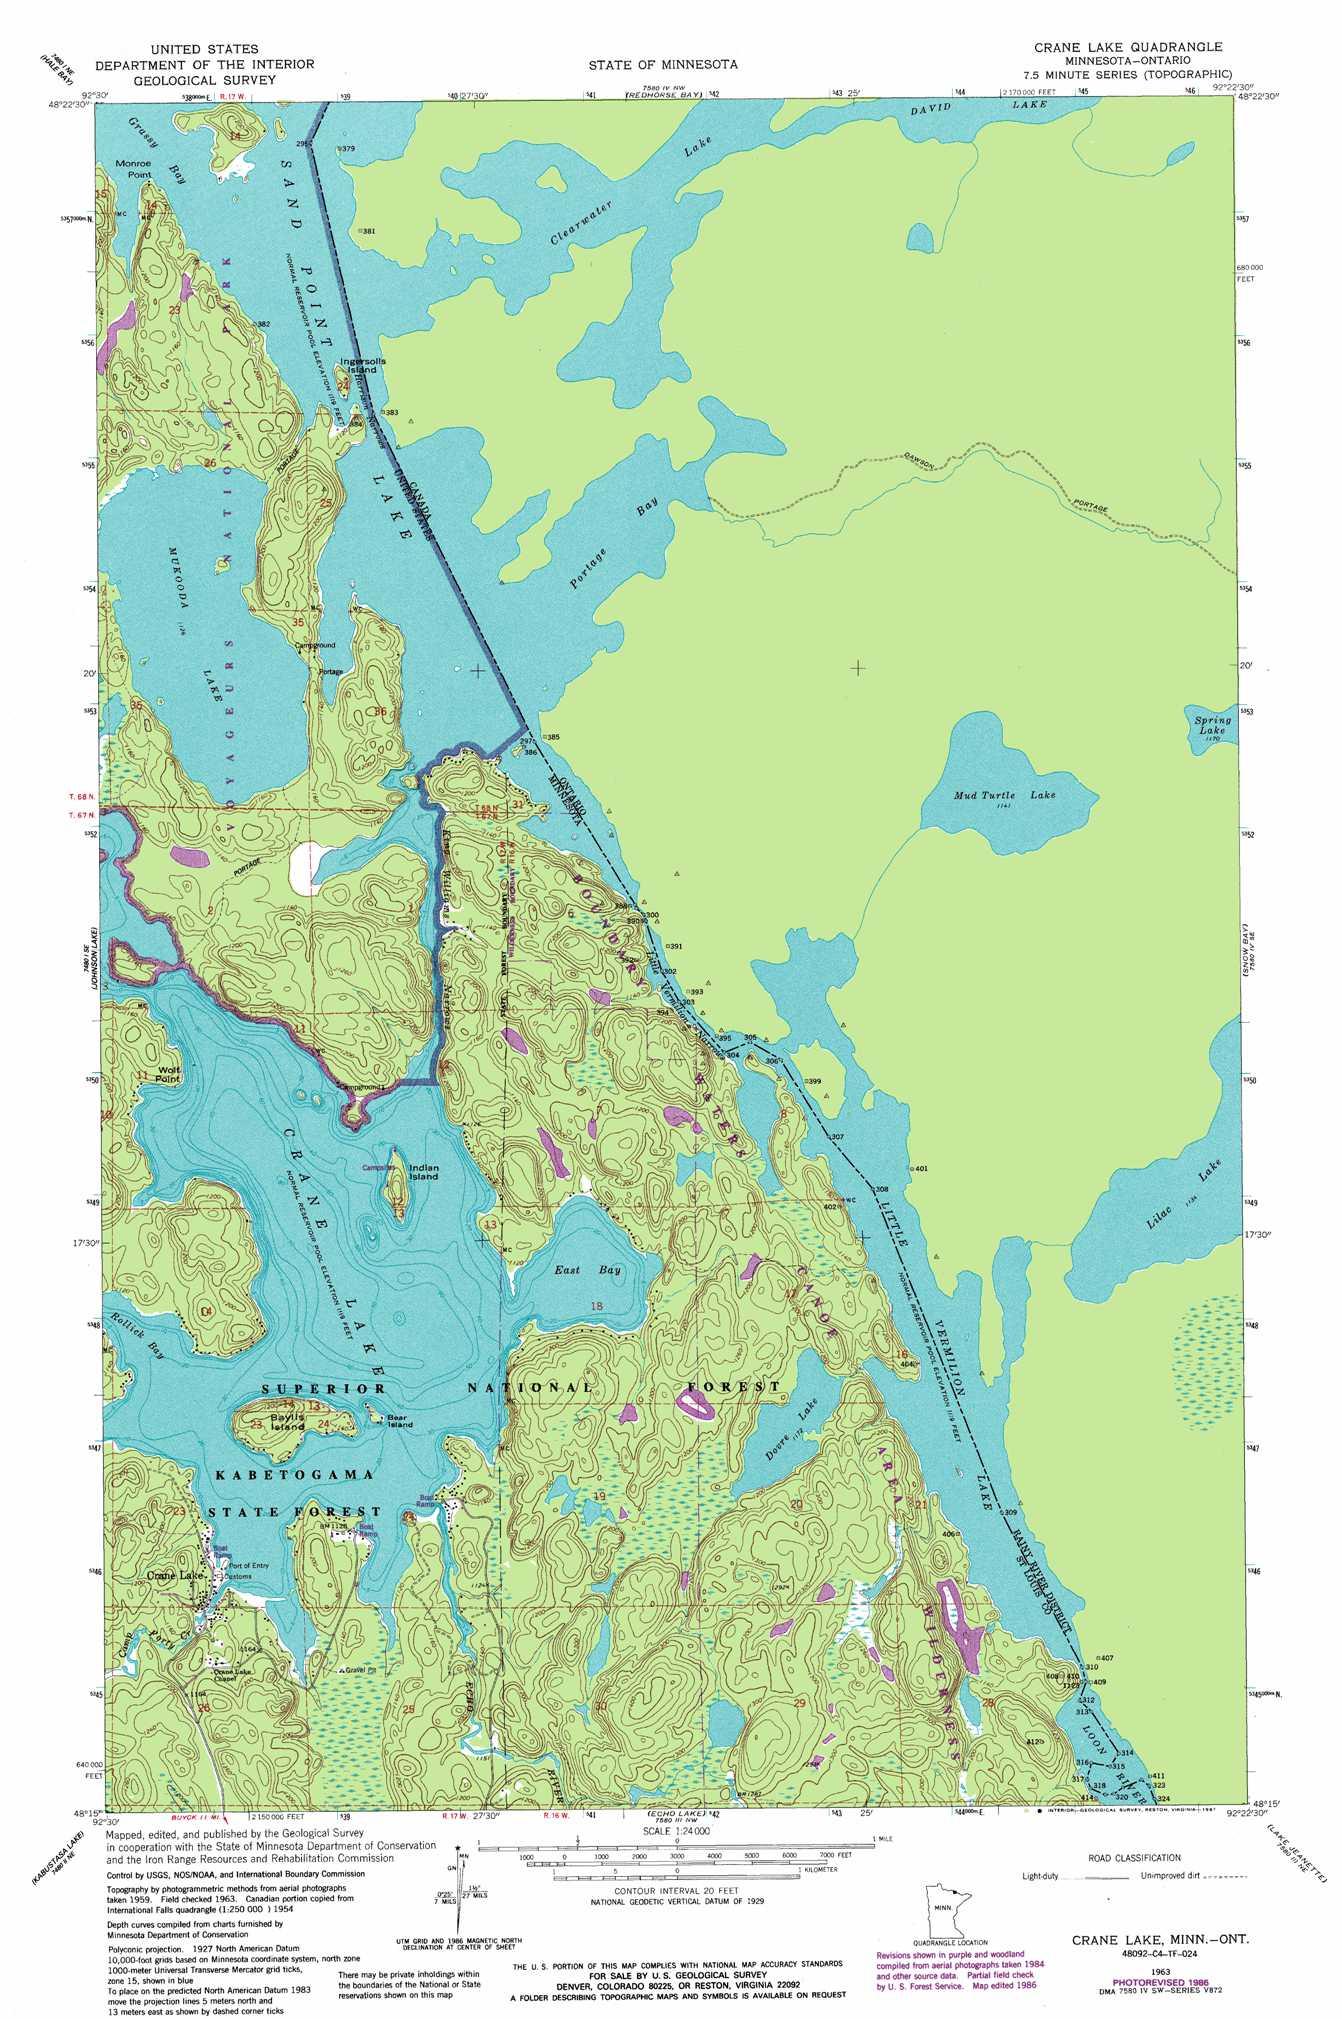 crane lake minnesota map Crane Lake Topographic Map Mn Usgs Topo Quad 48092c4 crane lake minnesota map